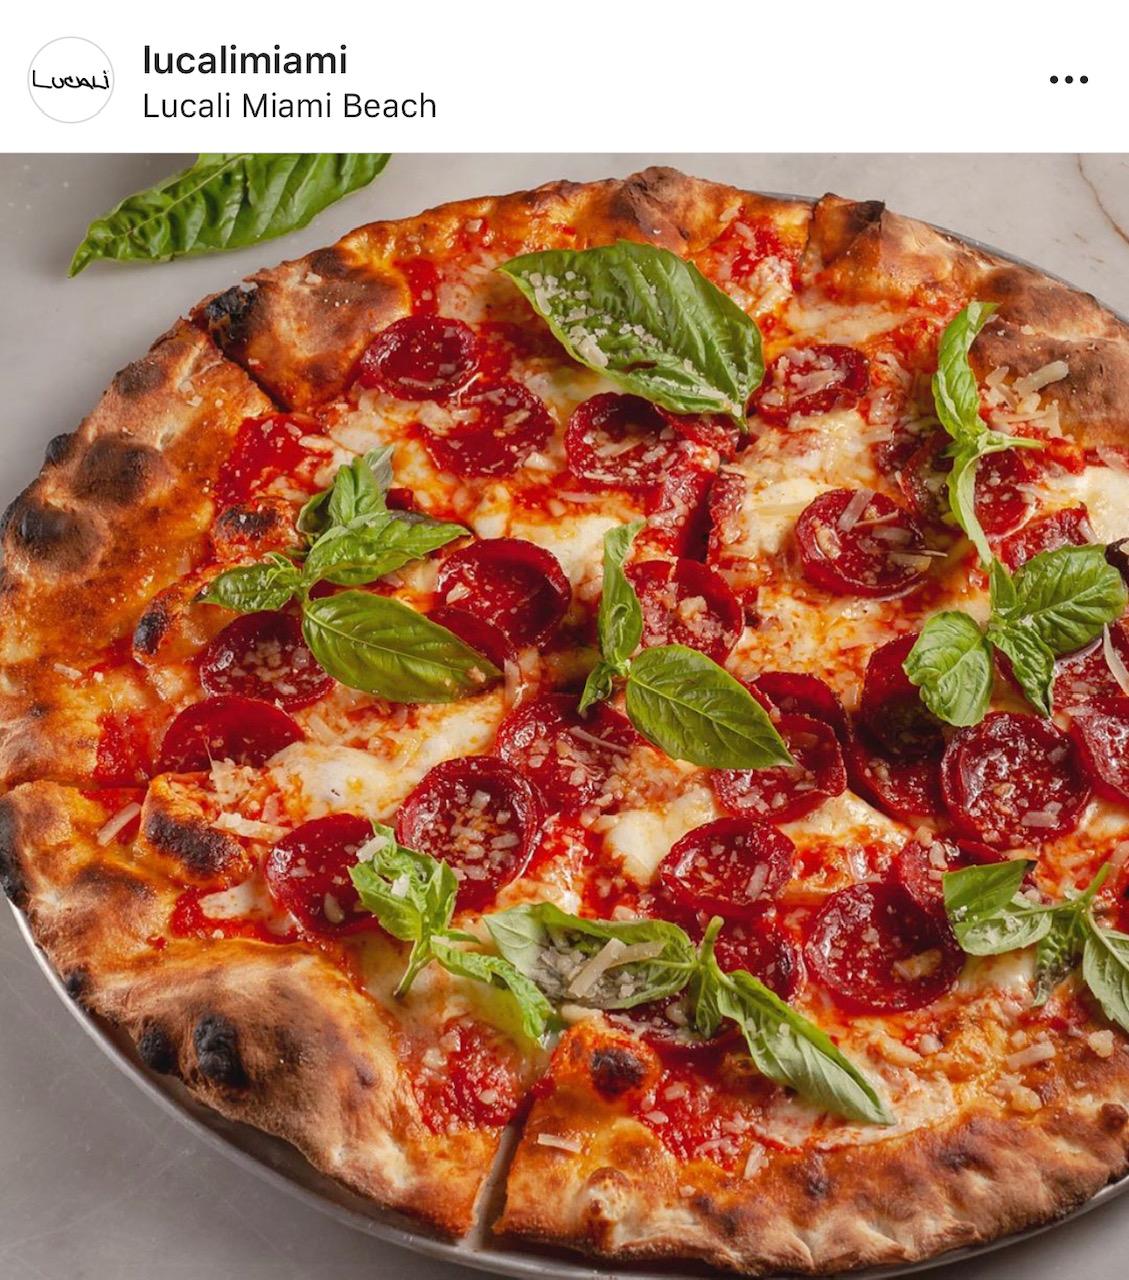 Lucali Miami Beach Pizza.jpg